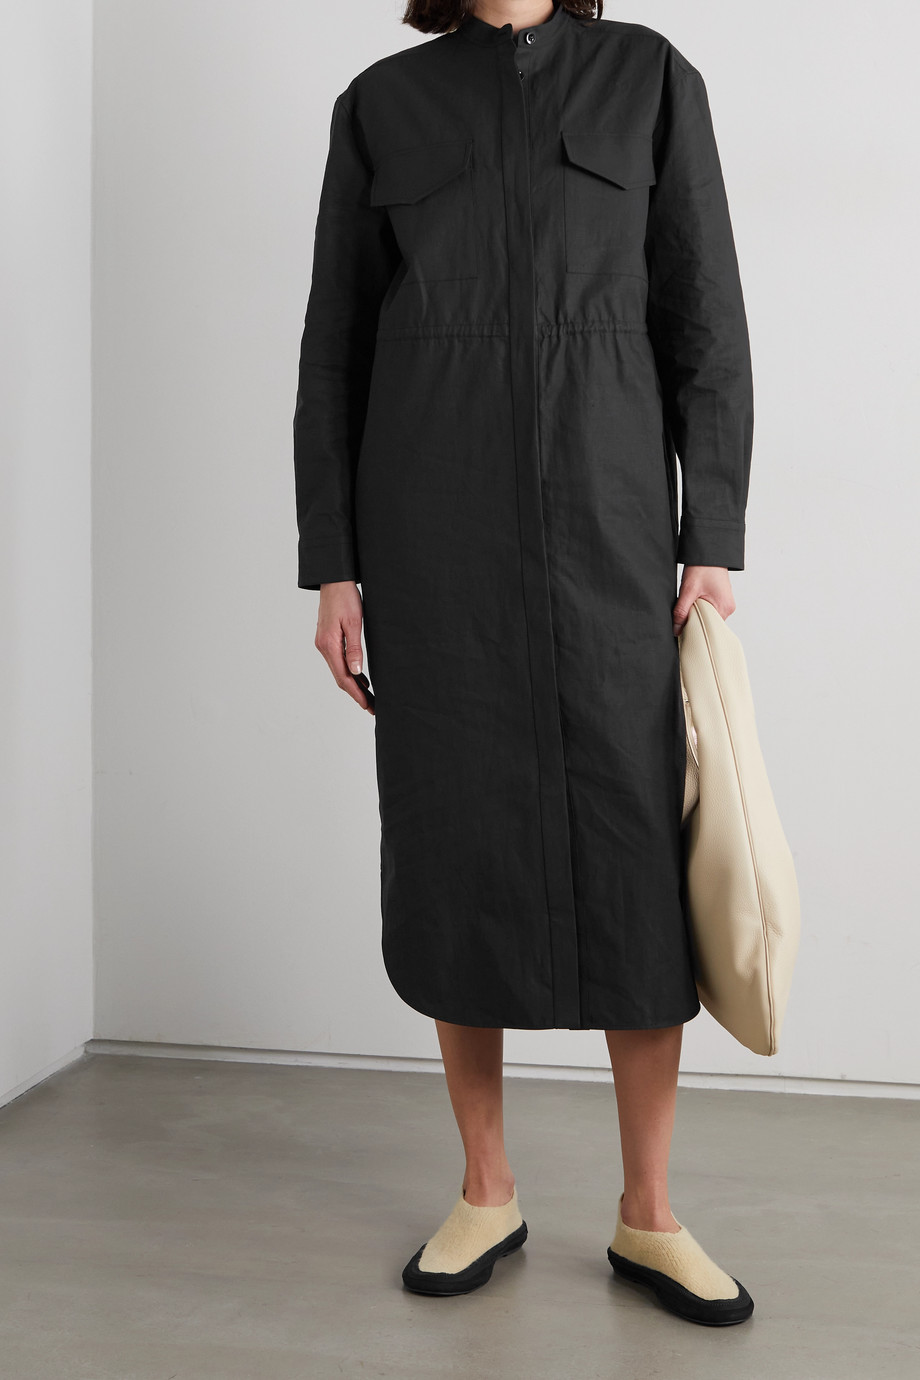 Jil Sander Coated-linen midi dress